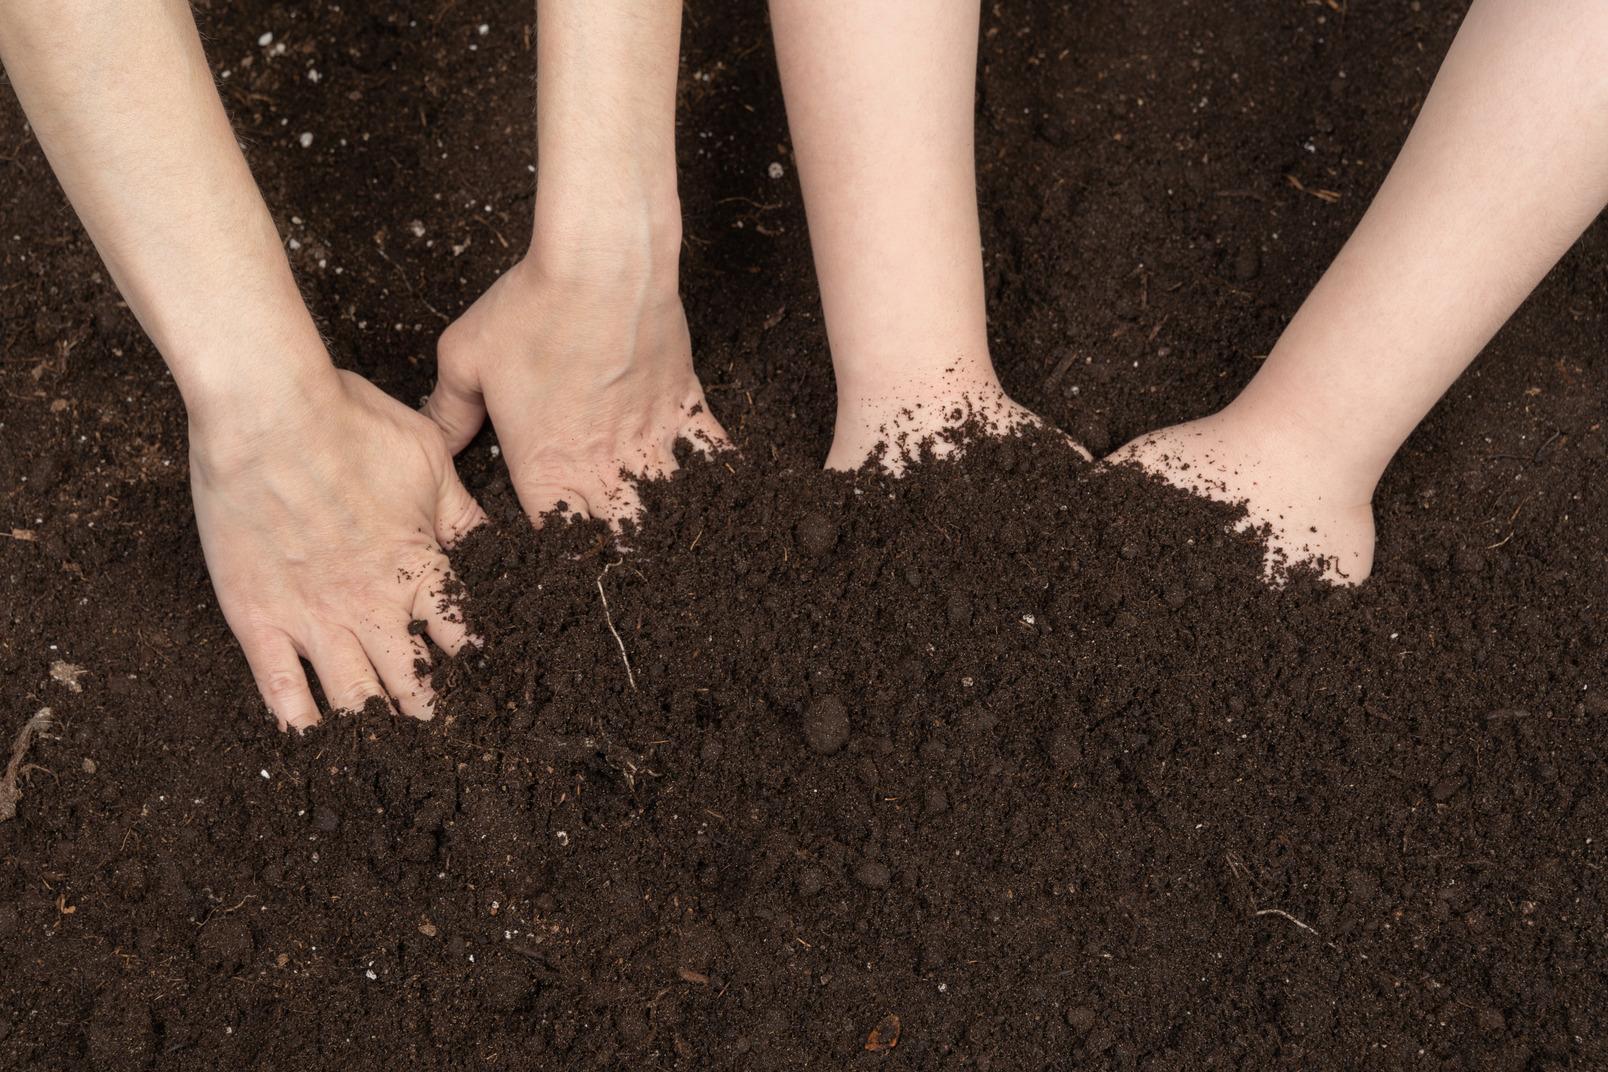 Dirty human hands after gardening